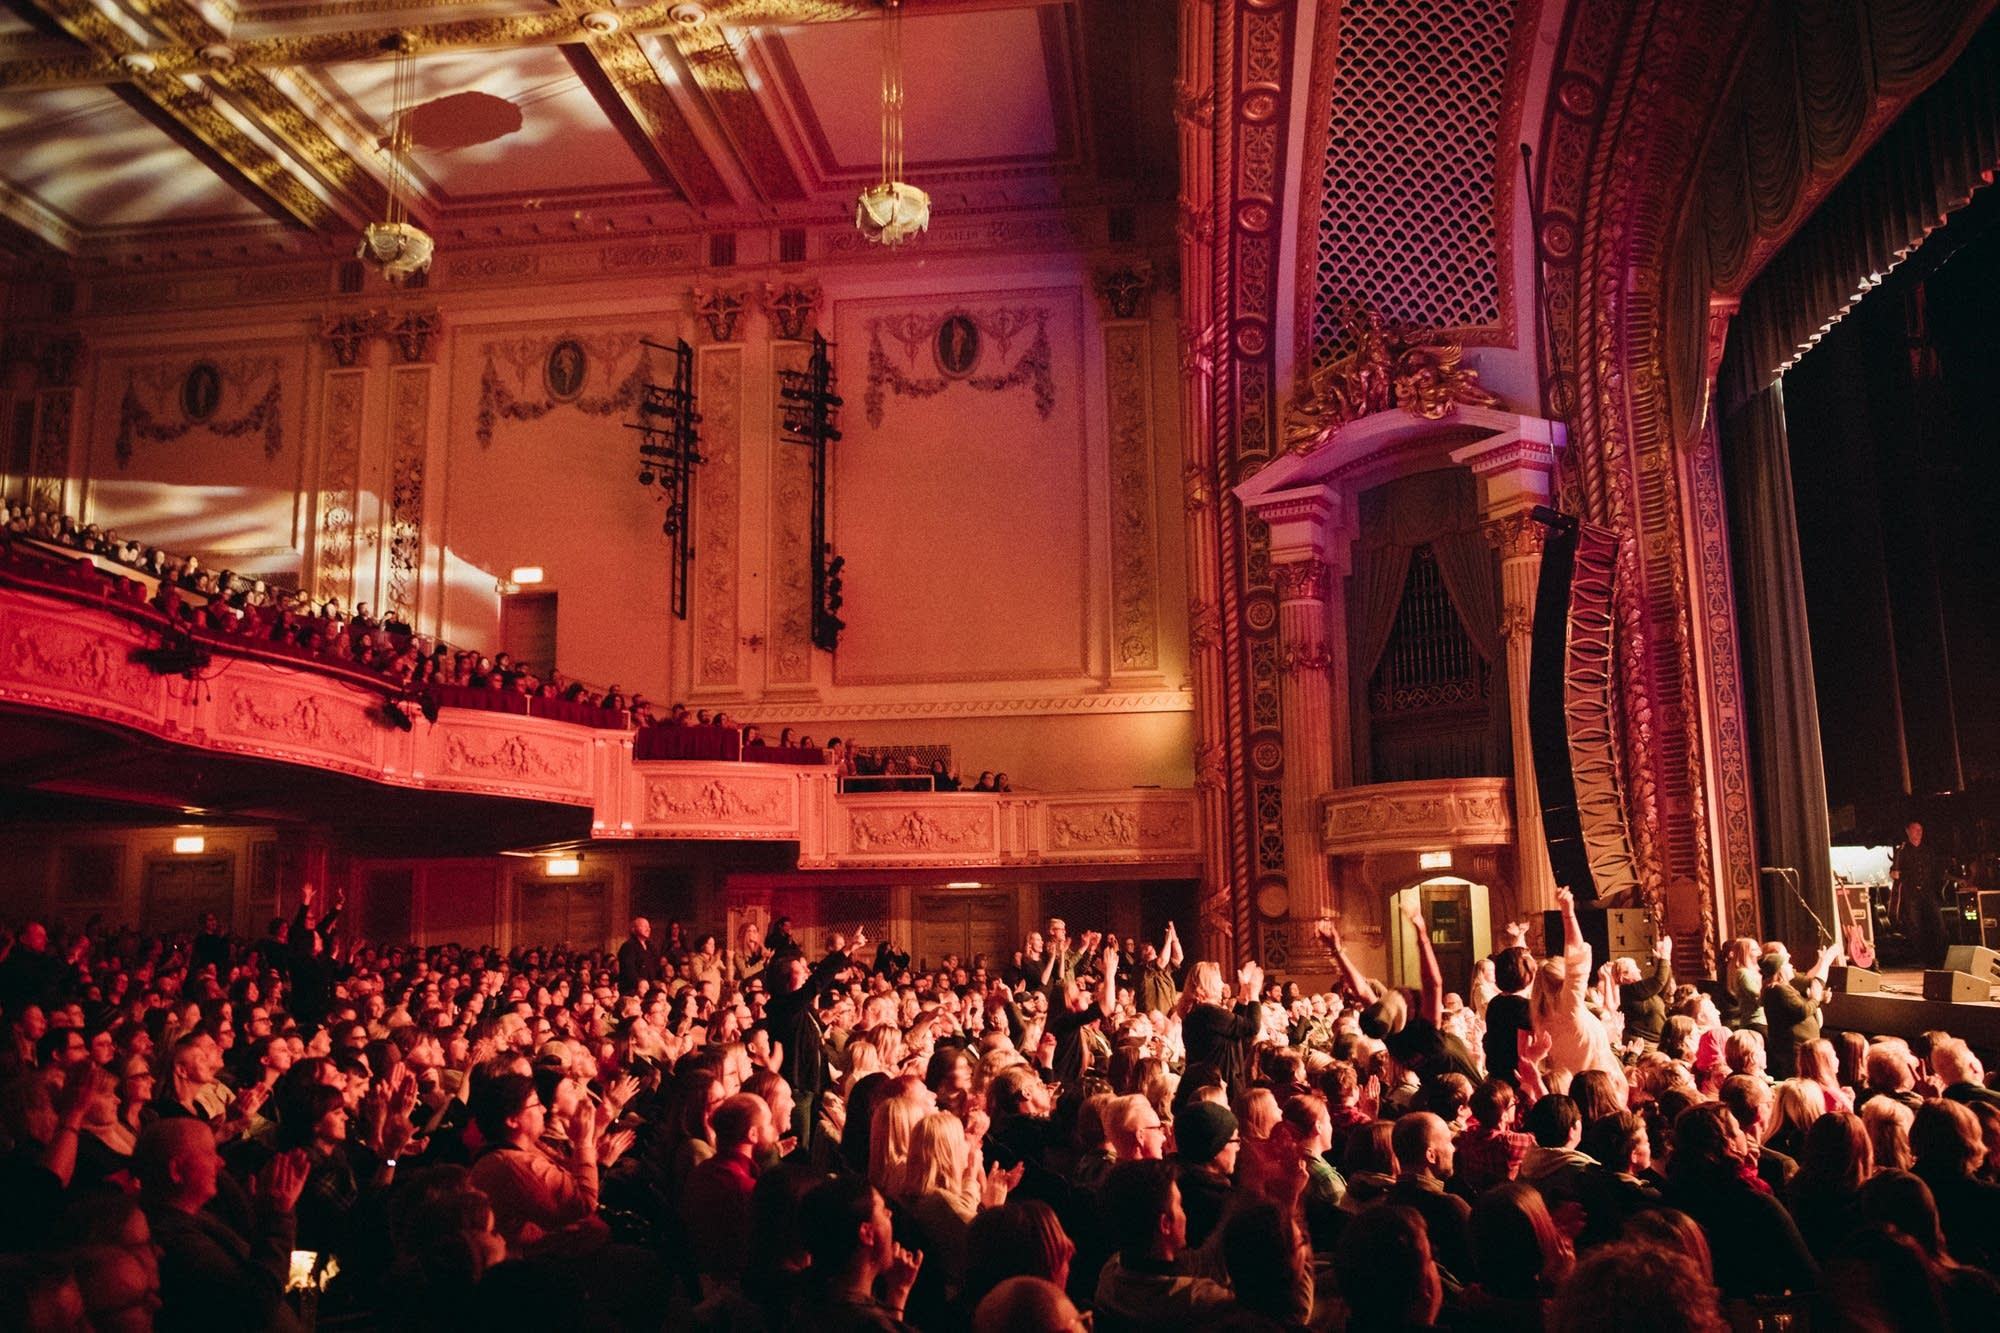 Brandi Carlile in concert at the State Theatre in Minneapolis